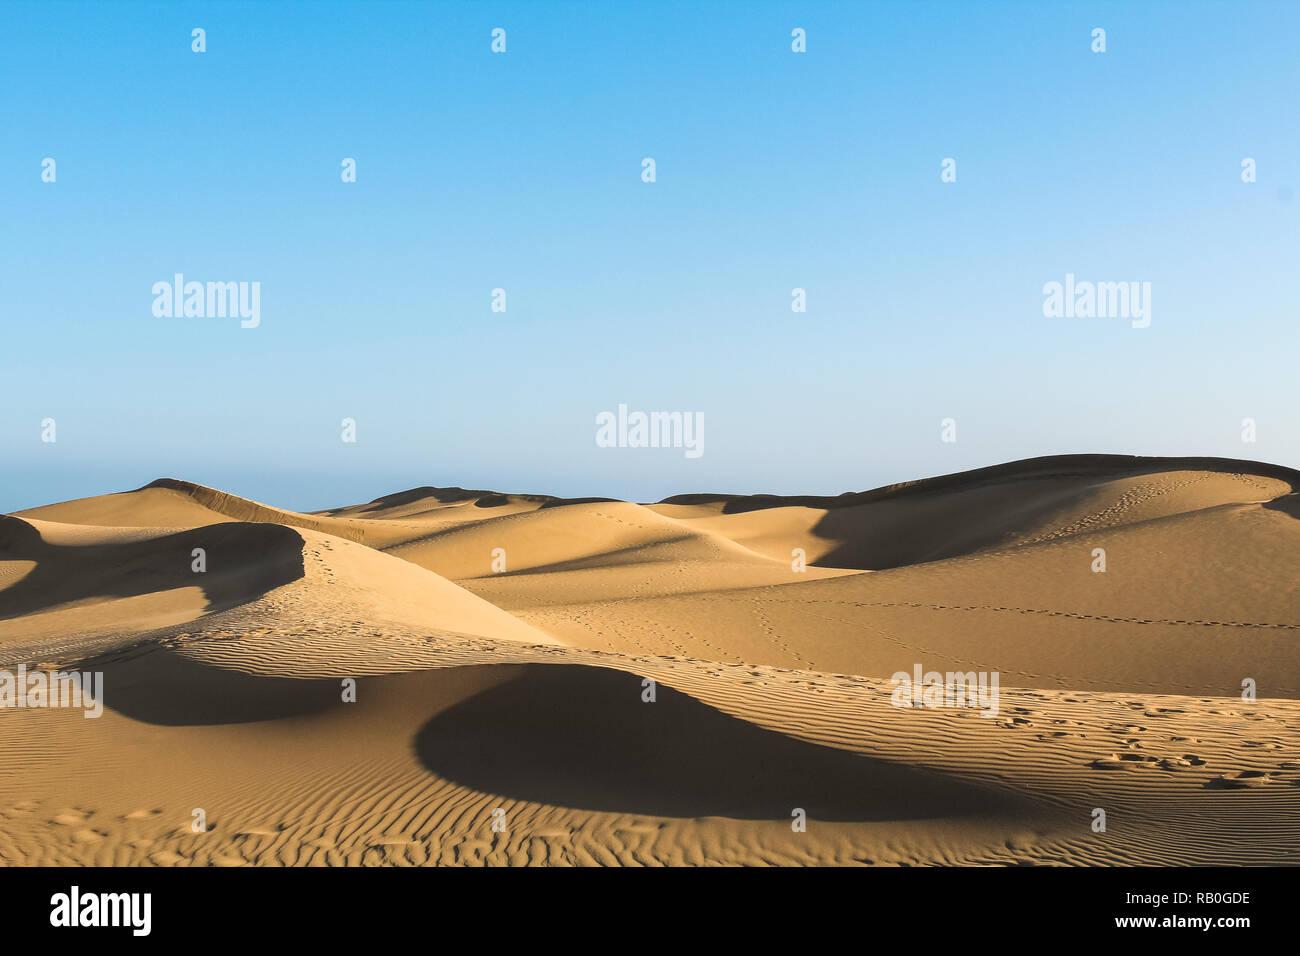 Cascading Sanddünen in der Wüste werfen lange Schatten bei Sonnenuntergang (Dunas de Maspalomas, Gran Canaria, Spanien, Europa) Stockfoto